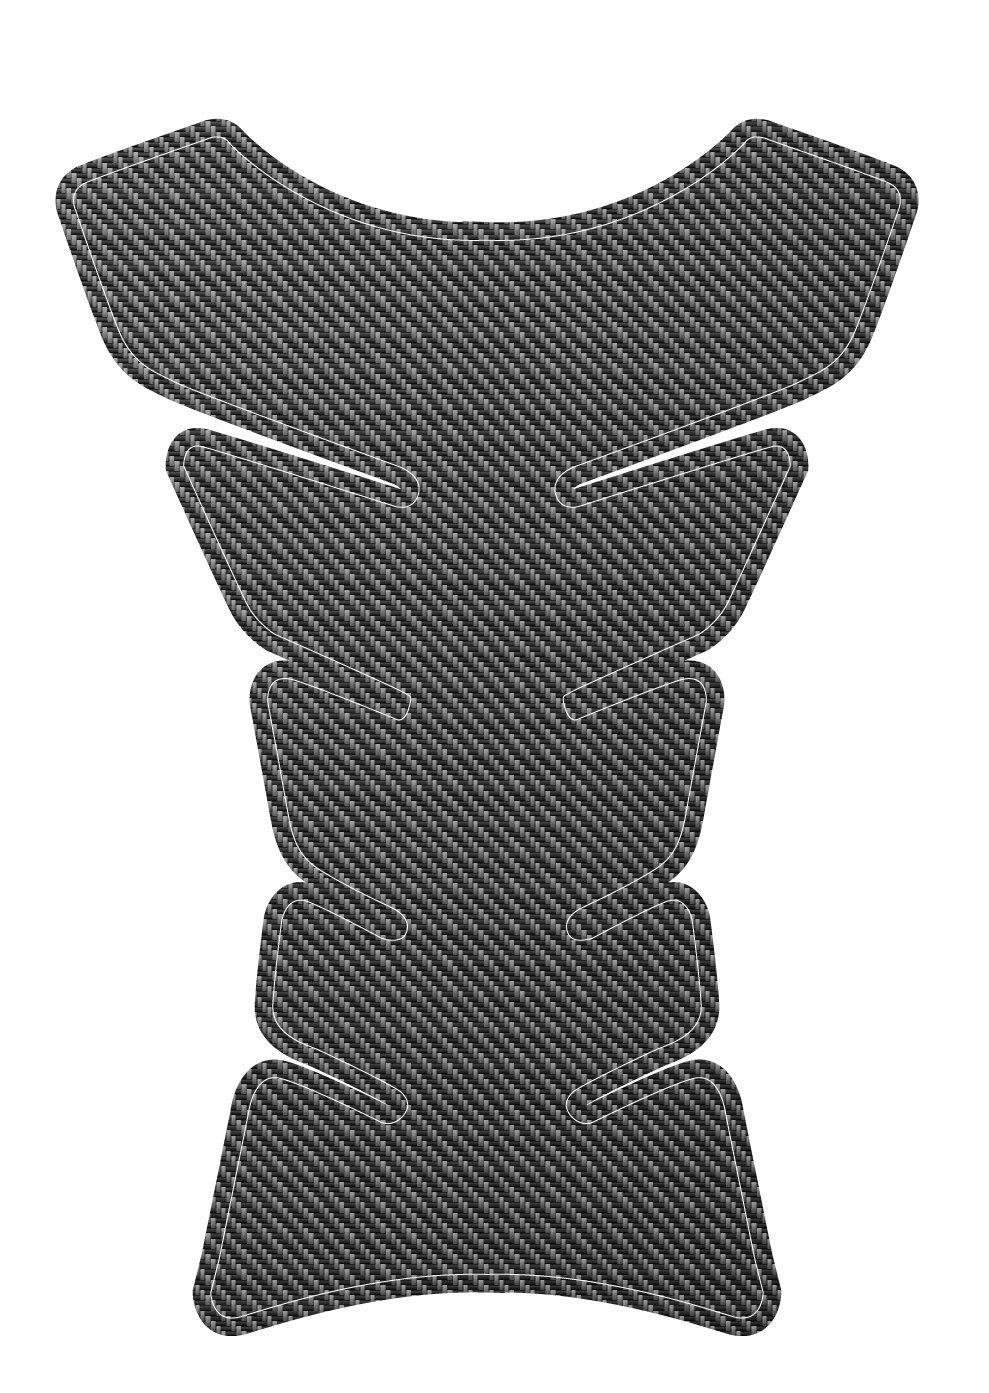 Carbon Universal Protective Fuel Tank Pad for Motorbikes 3D Studio CC008